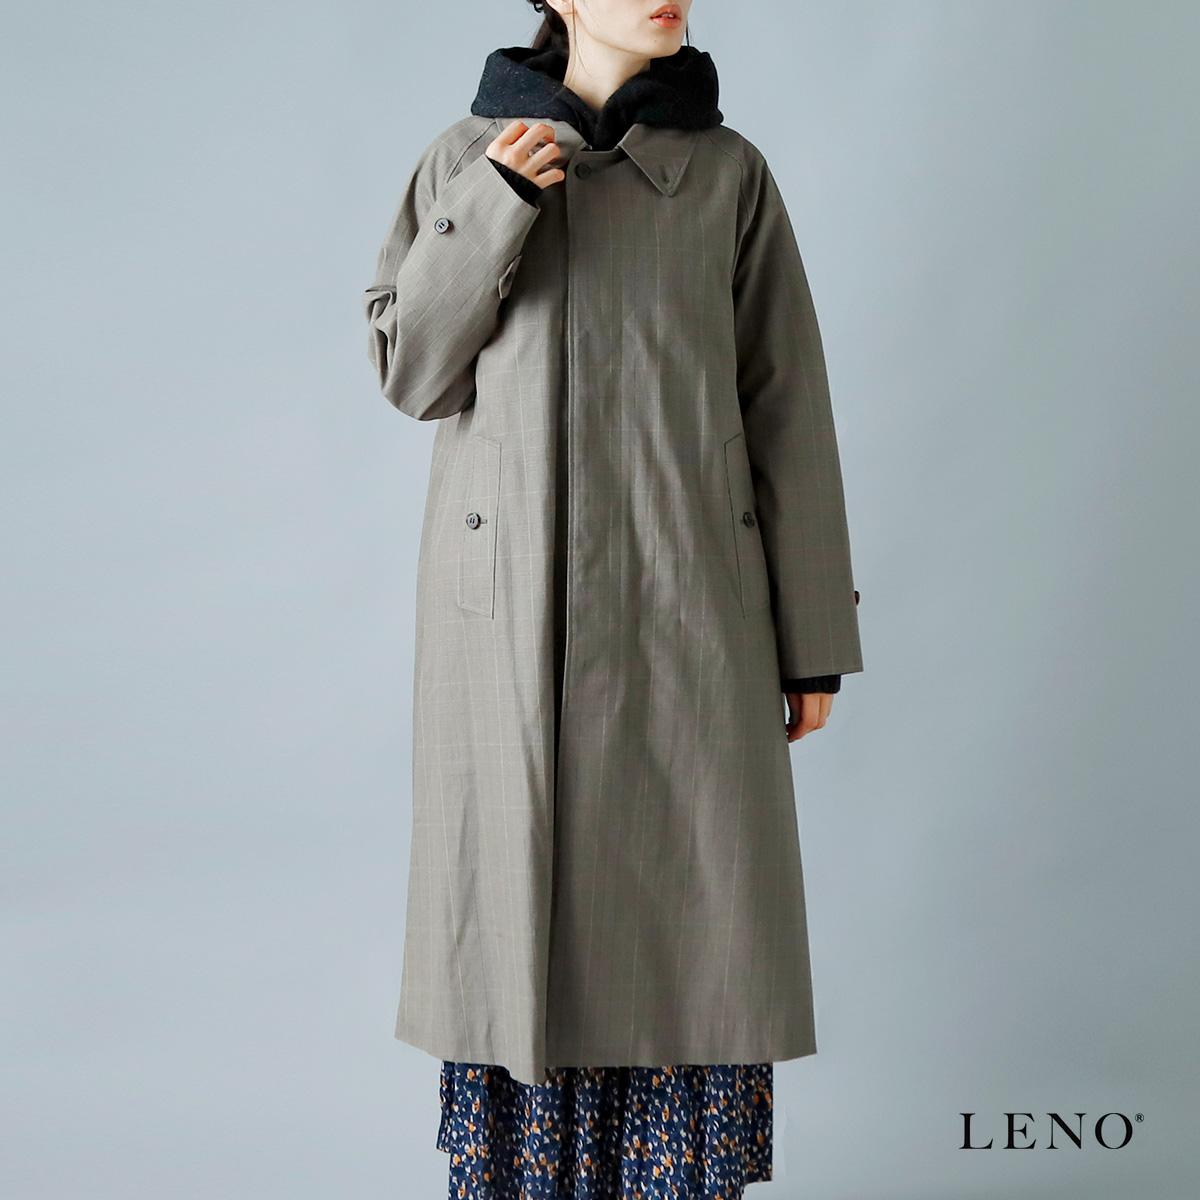 "LENO(リノ)オリジナル強撚ギャバジンコットンバルカラーコート""BAL COLLAR COAT"" leno-co003"